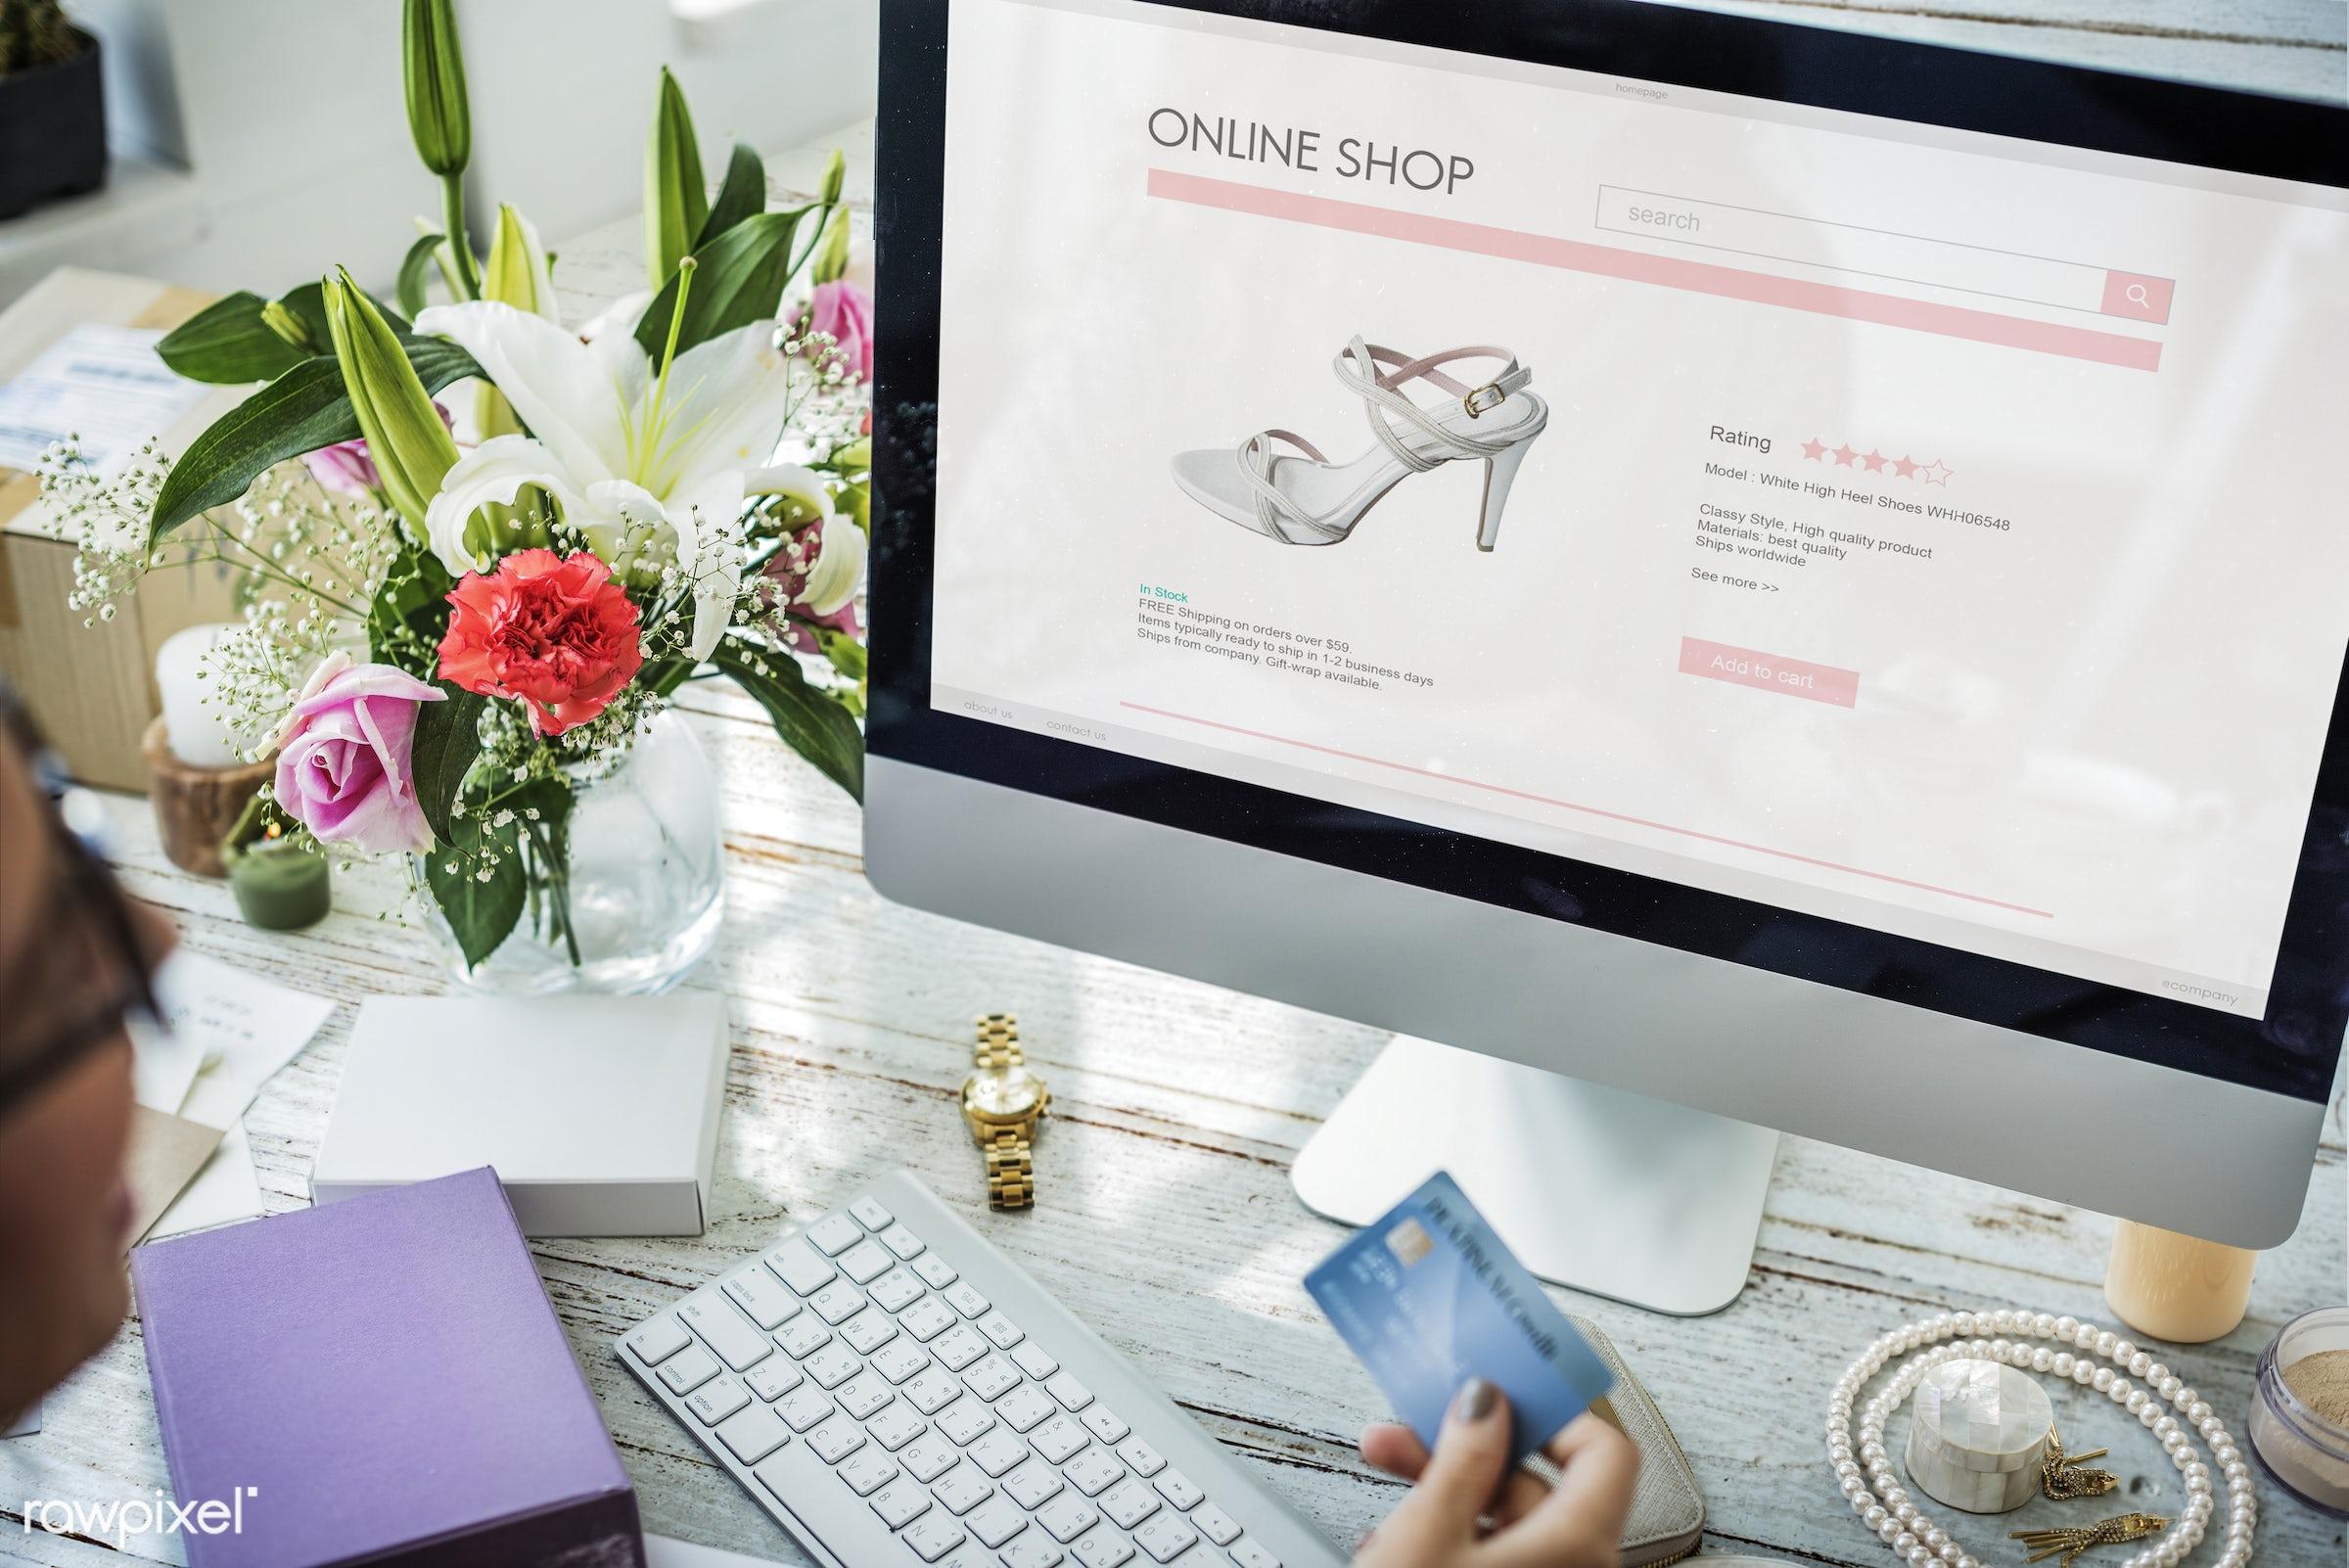 commerce, communication, computer, connect, connection, convenience, customer, device, digital, finance, internet, laptop,...